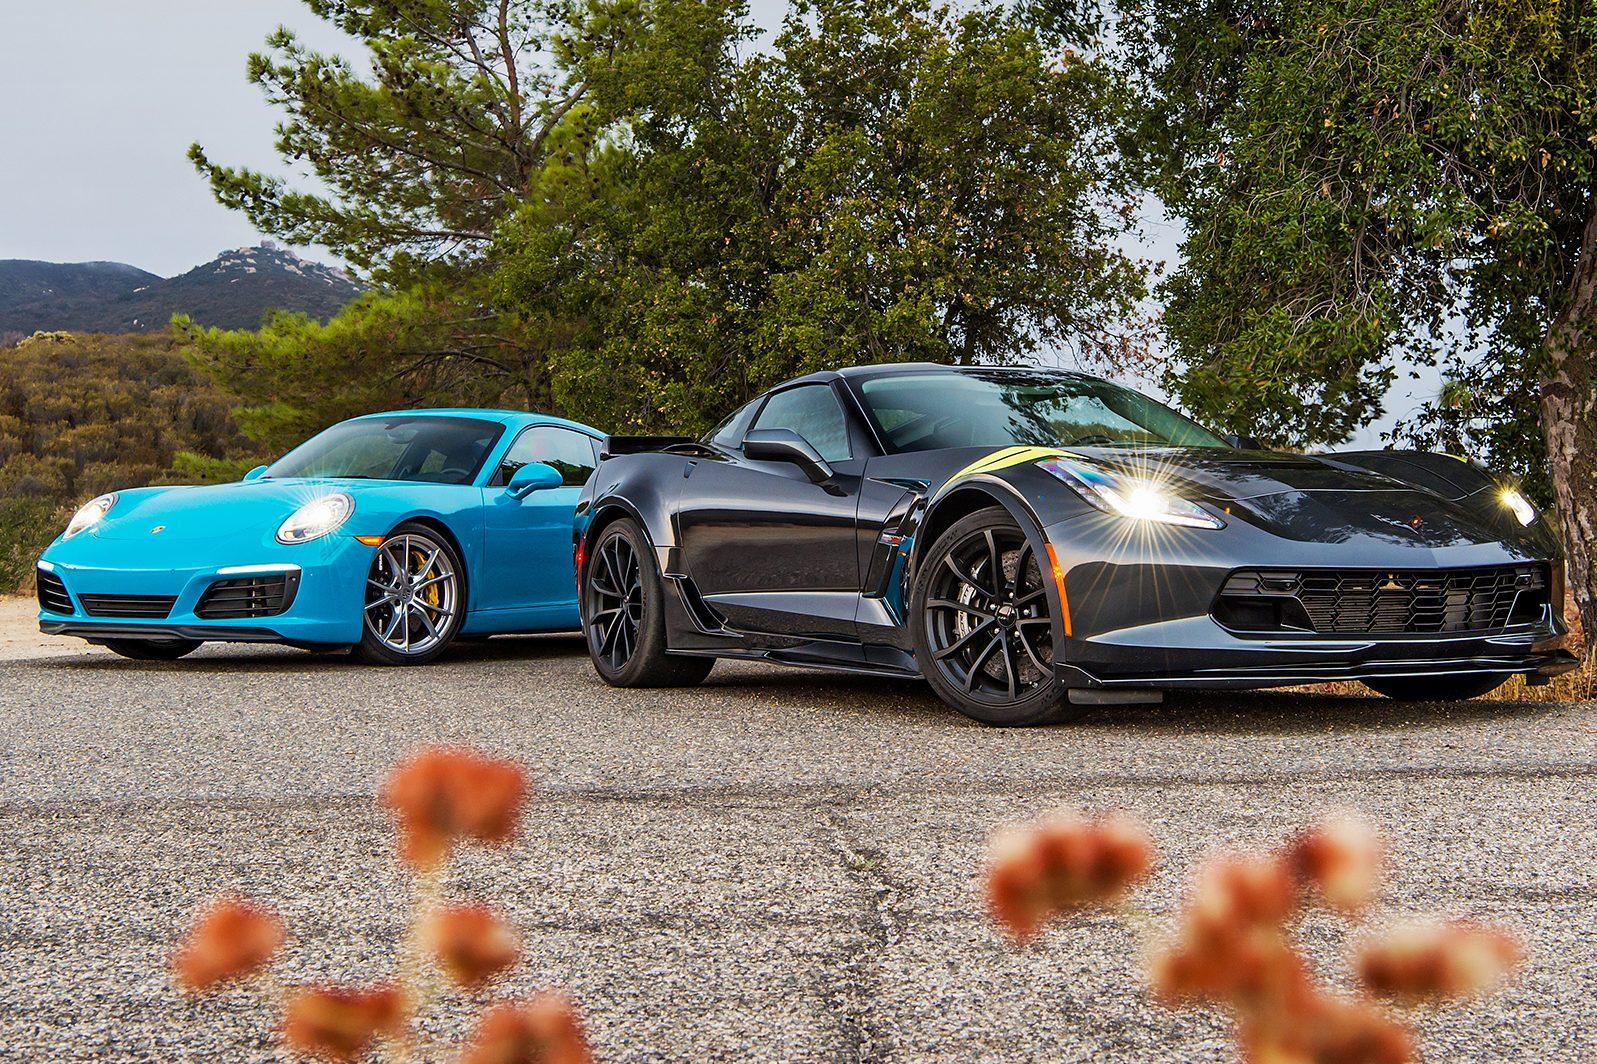 2017-Chevrolet-Corvette-Grand-Sport-vs-2017-Porsche-911-Carrera-S-front-three-quarter-03-e1475596307160